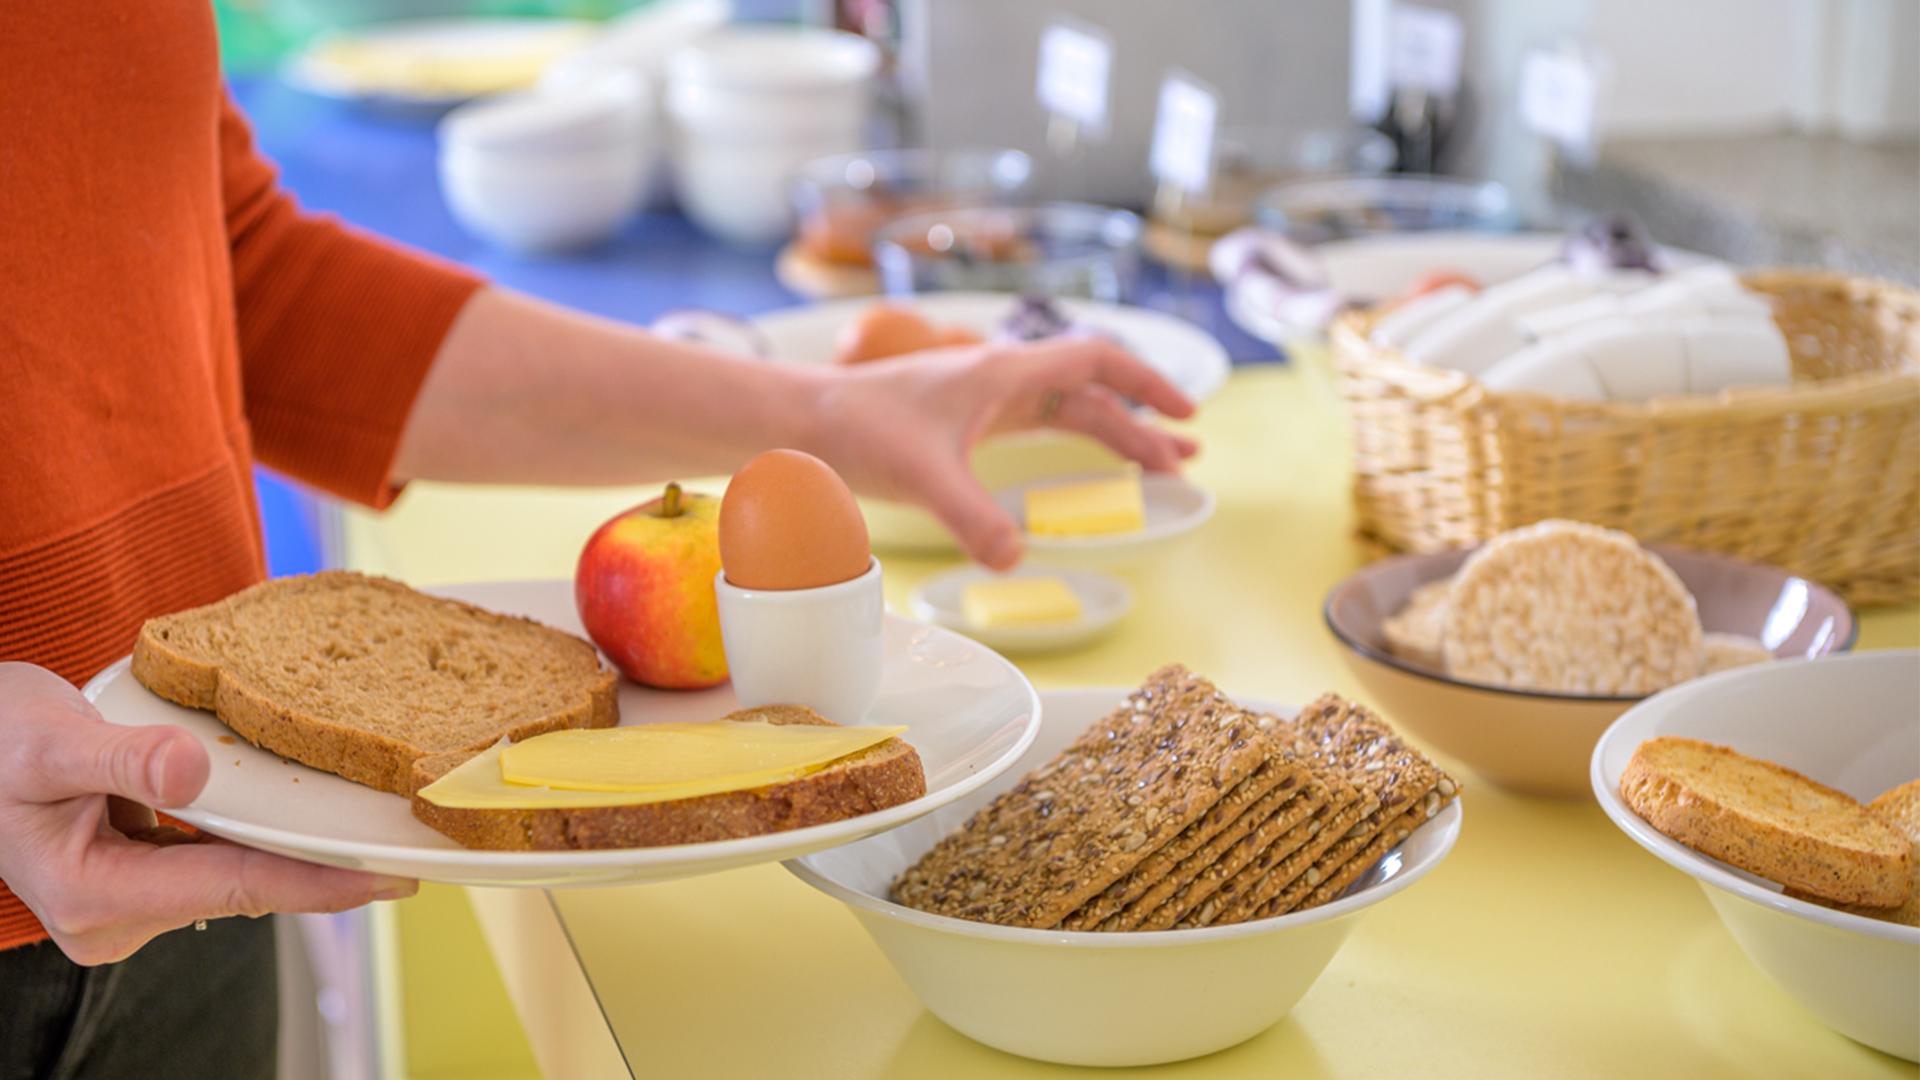 Ontbijt buffet beschuit crackers rijstewafel bord lopen broodje kaas fruit